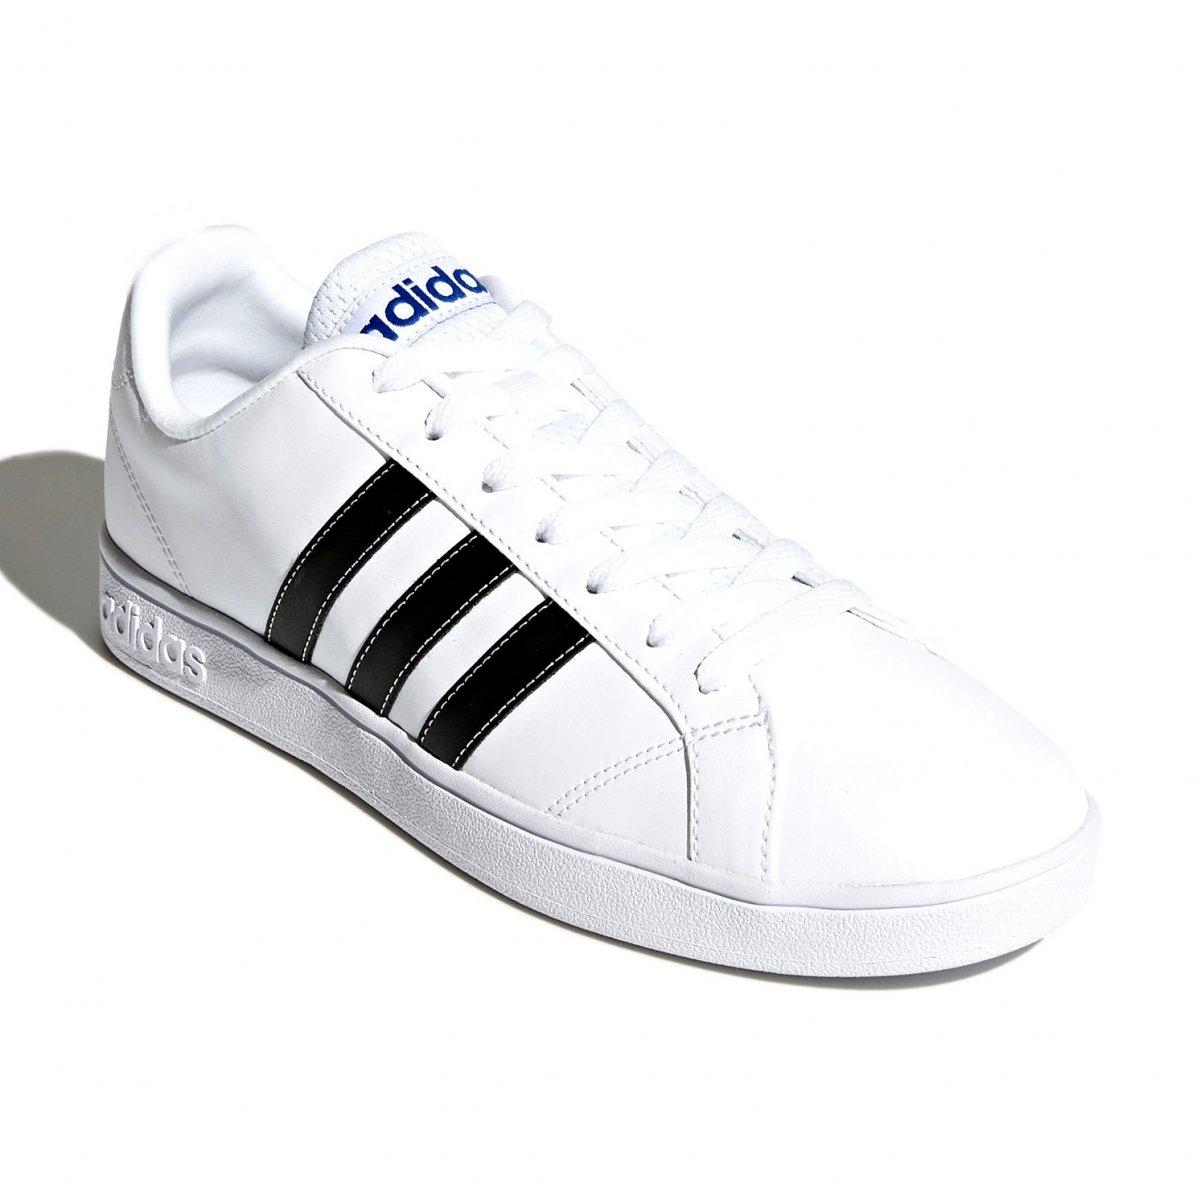 804786d8795 Tênis Masculino Adidas VS Advantage F99256 - Branco Preto - Botas ...